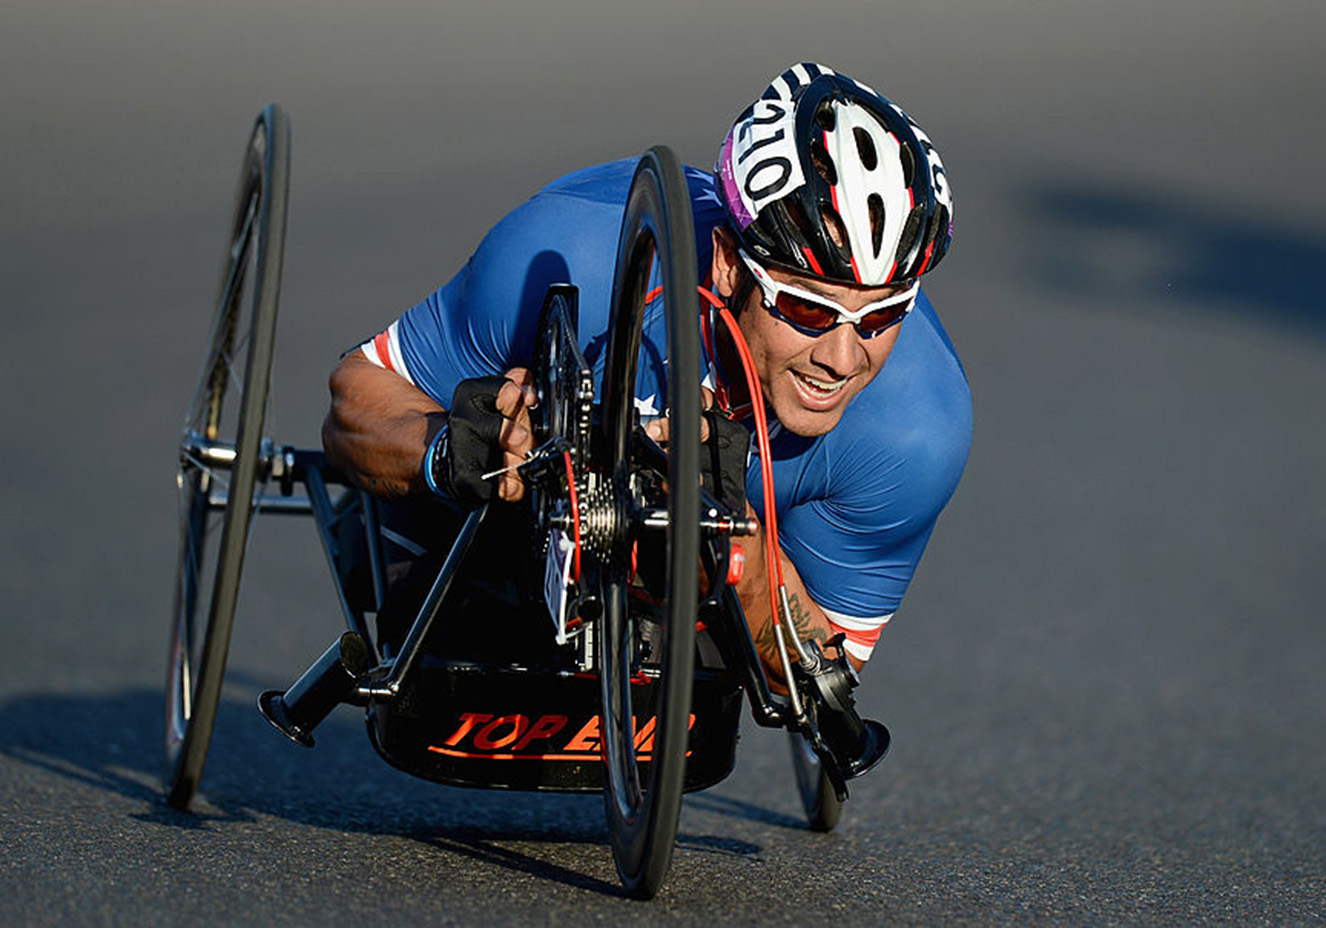 Gareth Copley/Equipa/Getty Images